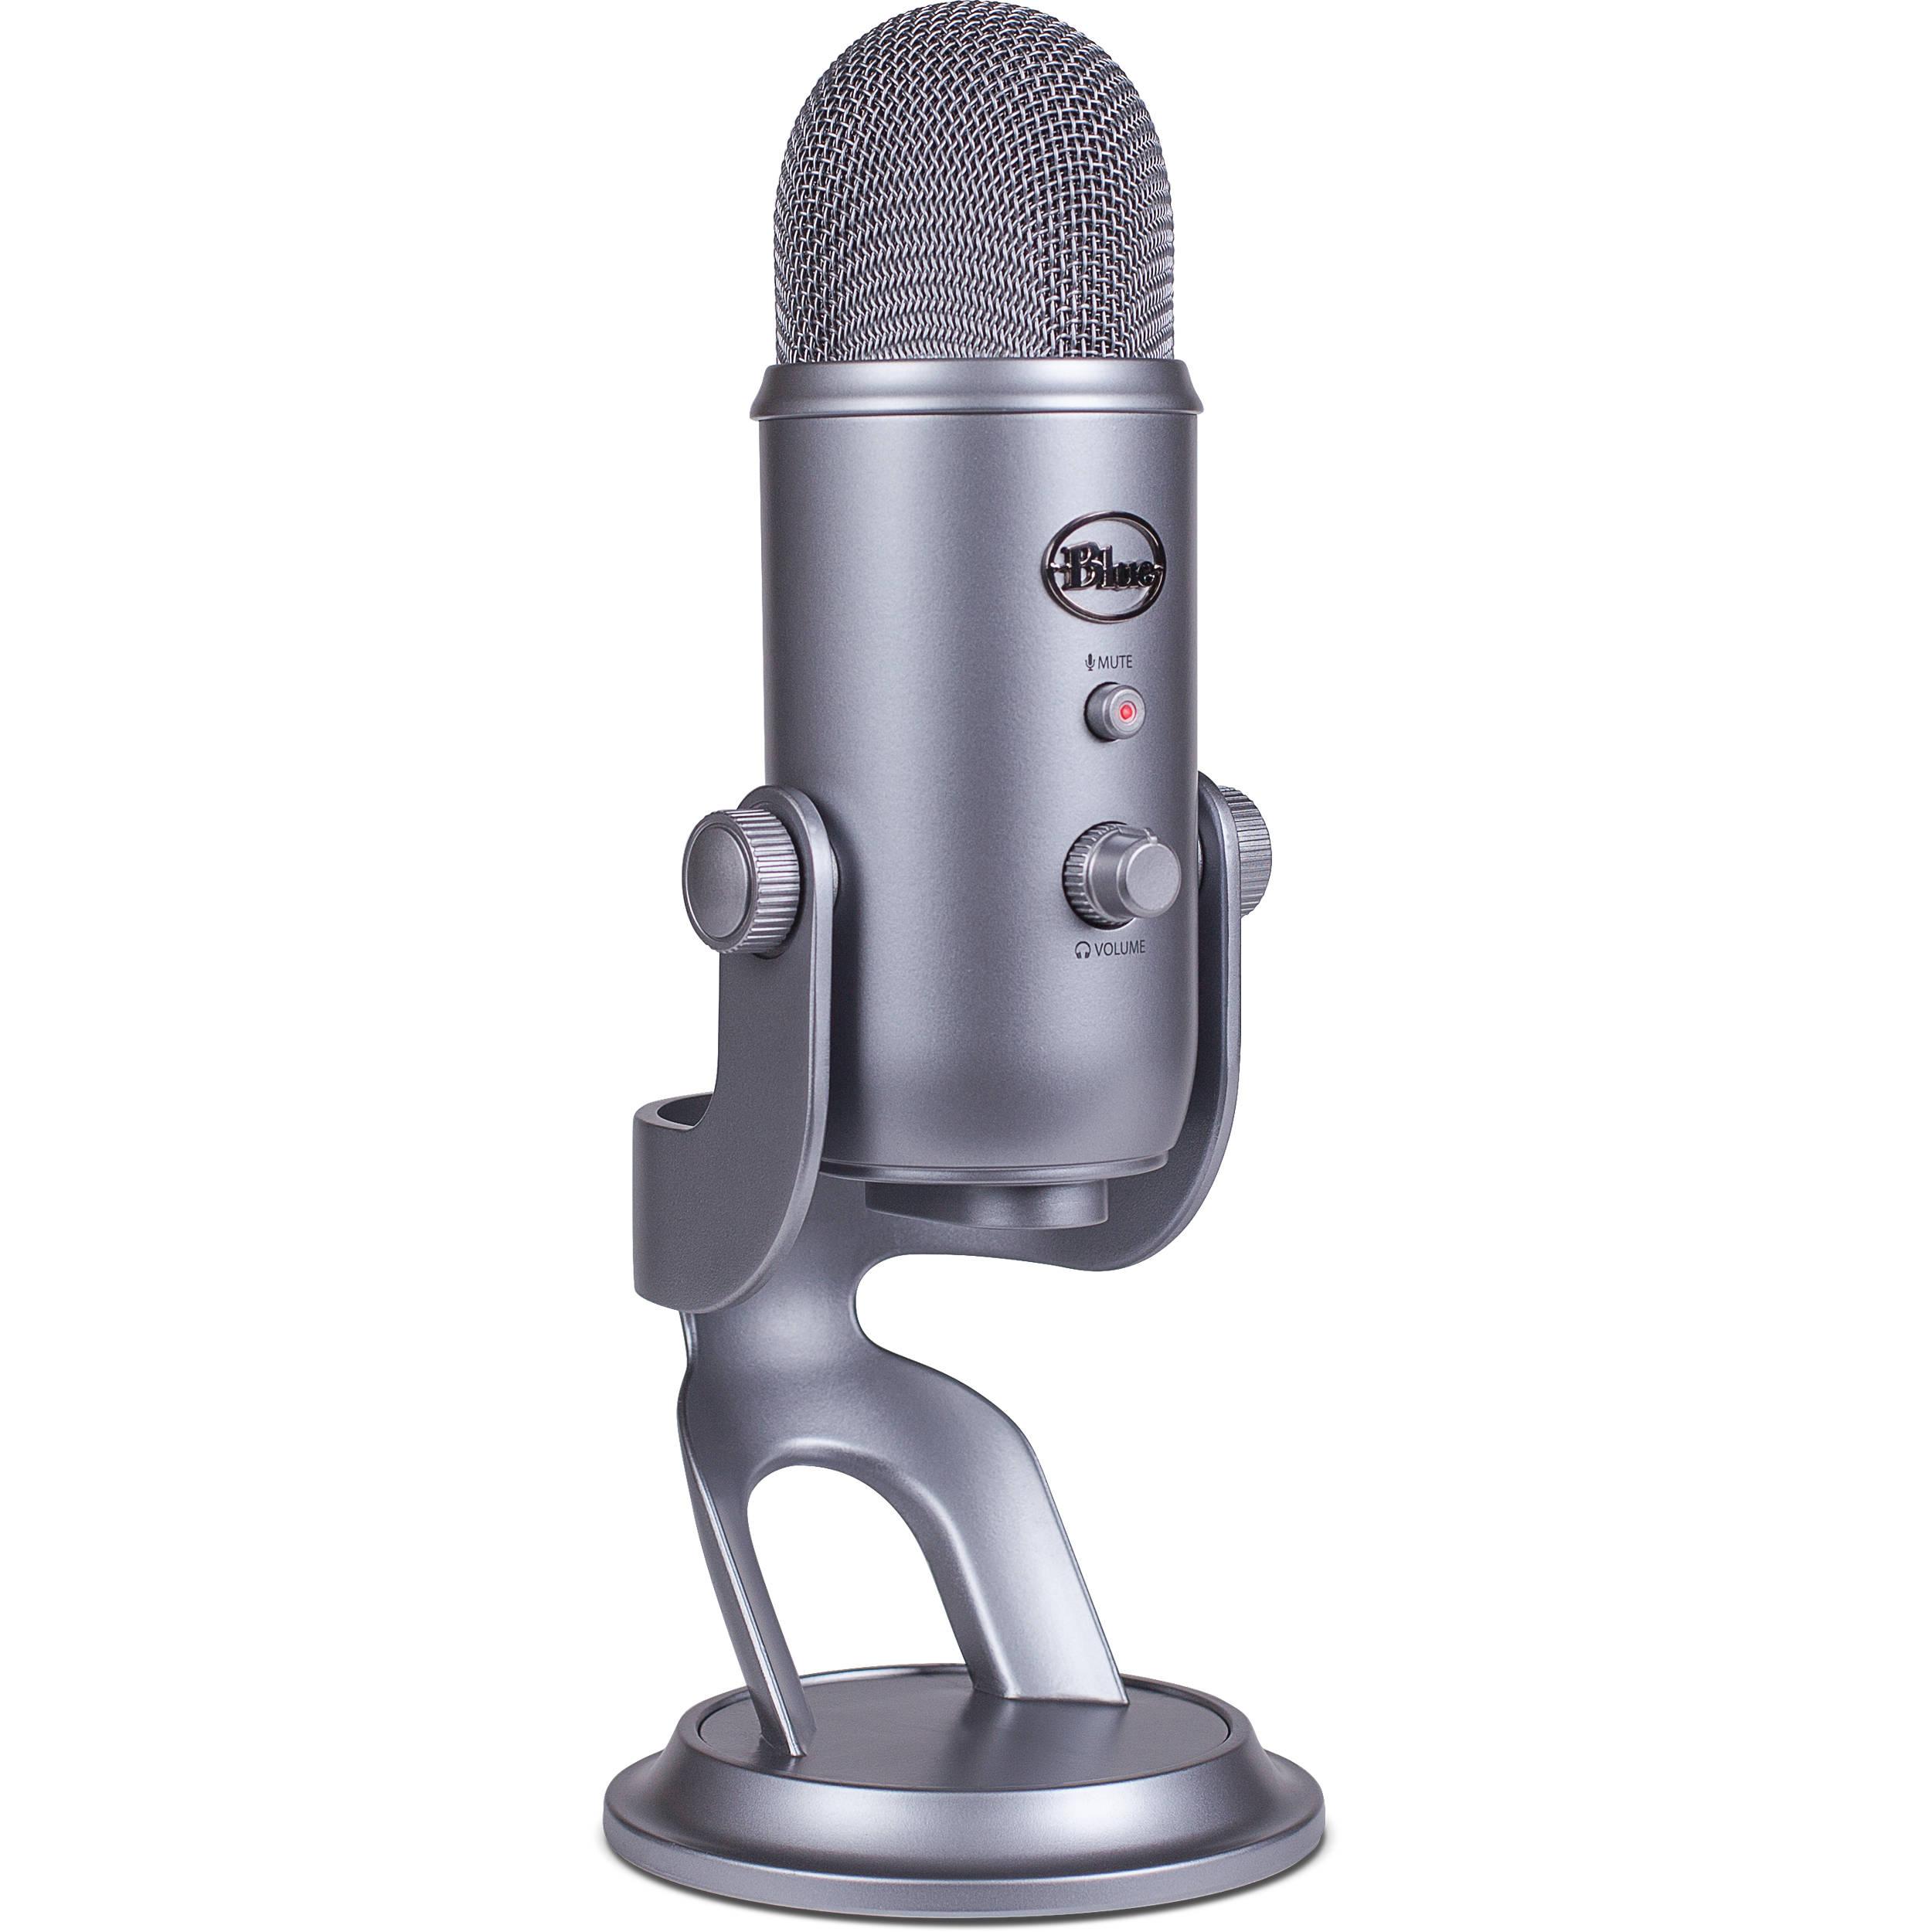 Blue Yeti USB Microphone (Cool Gray) YETI COOL GREY B&H Photo